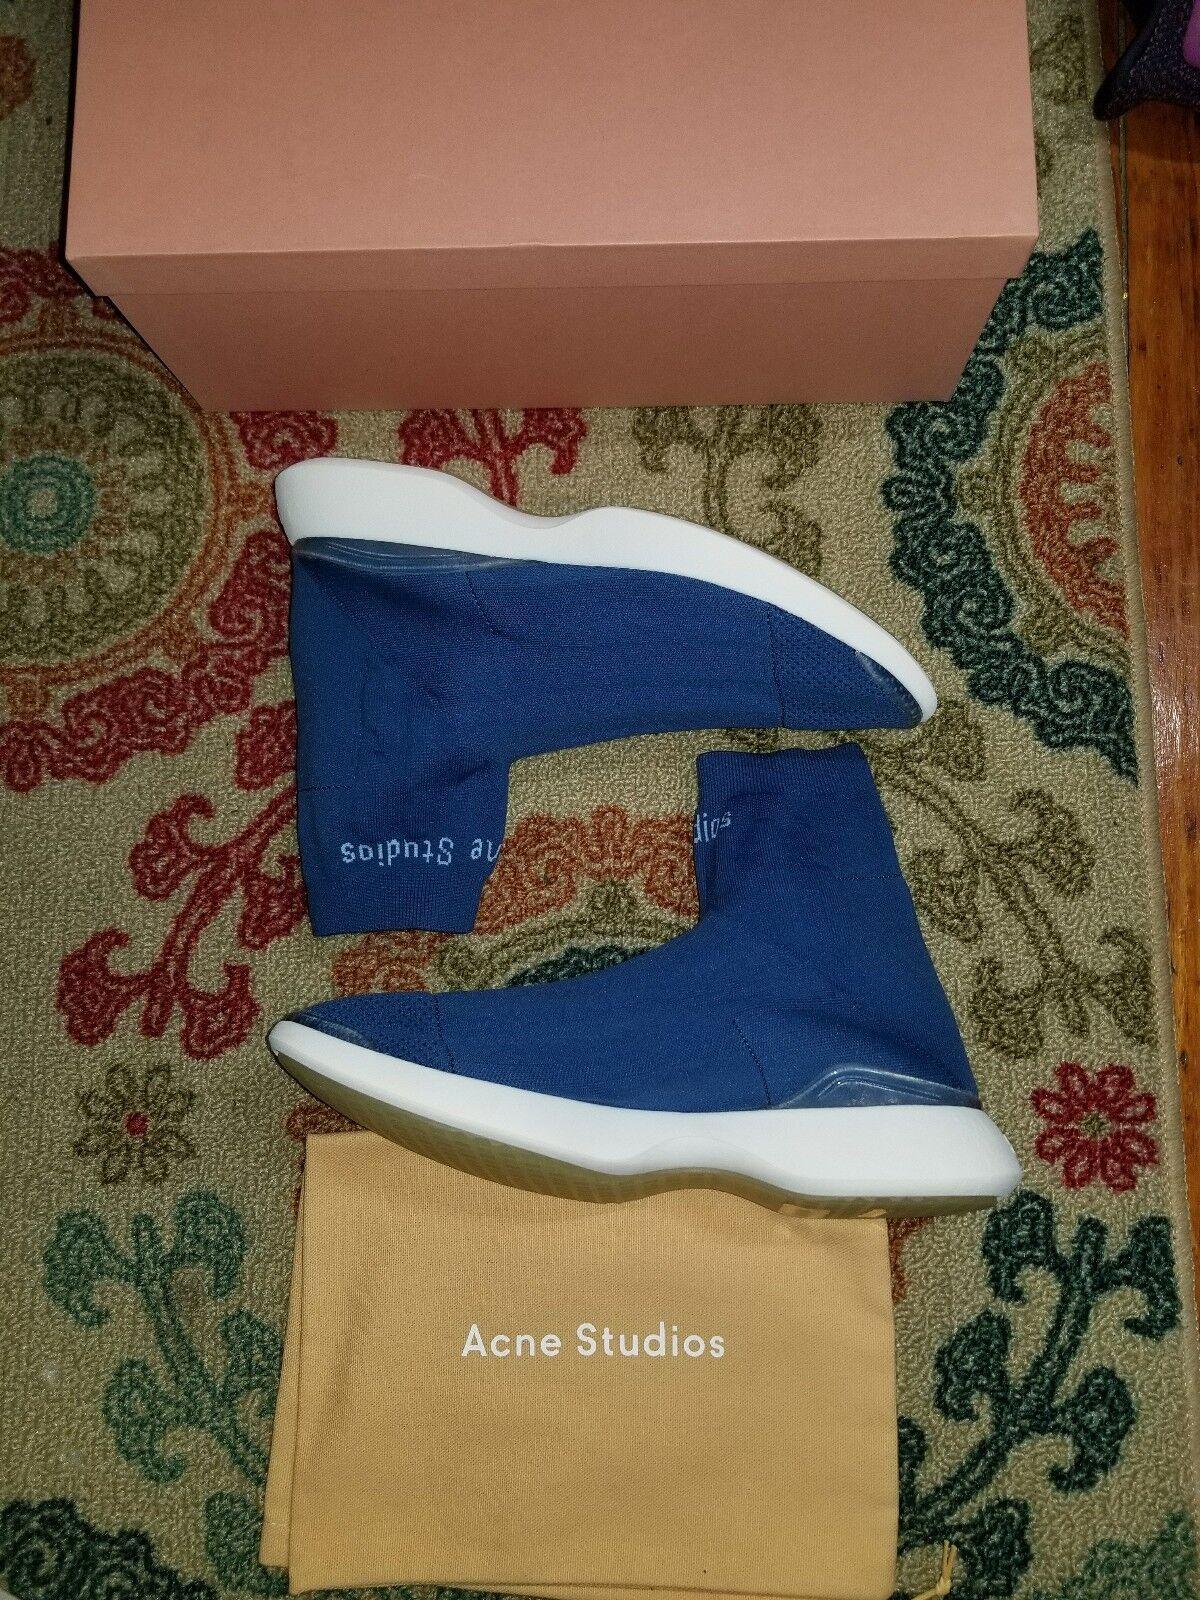 Acne Studios Studios Acne Tristian High-Top Speed Trainers Designer Fashion Stylist hypebeast 4fd41f